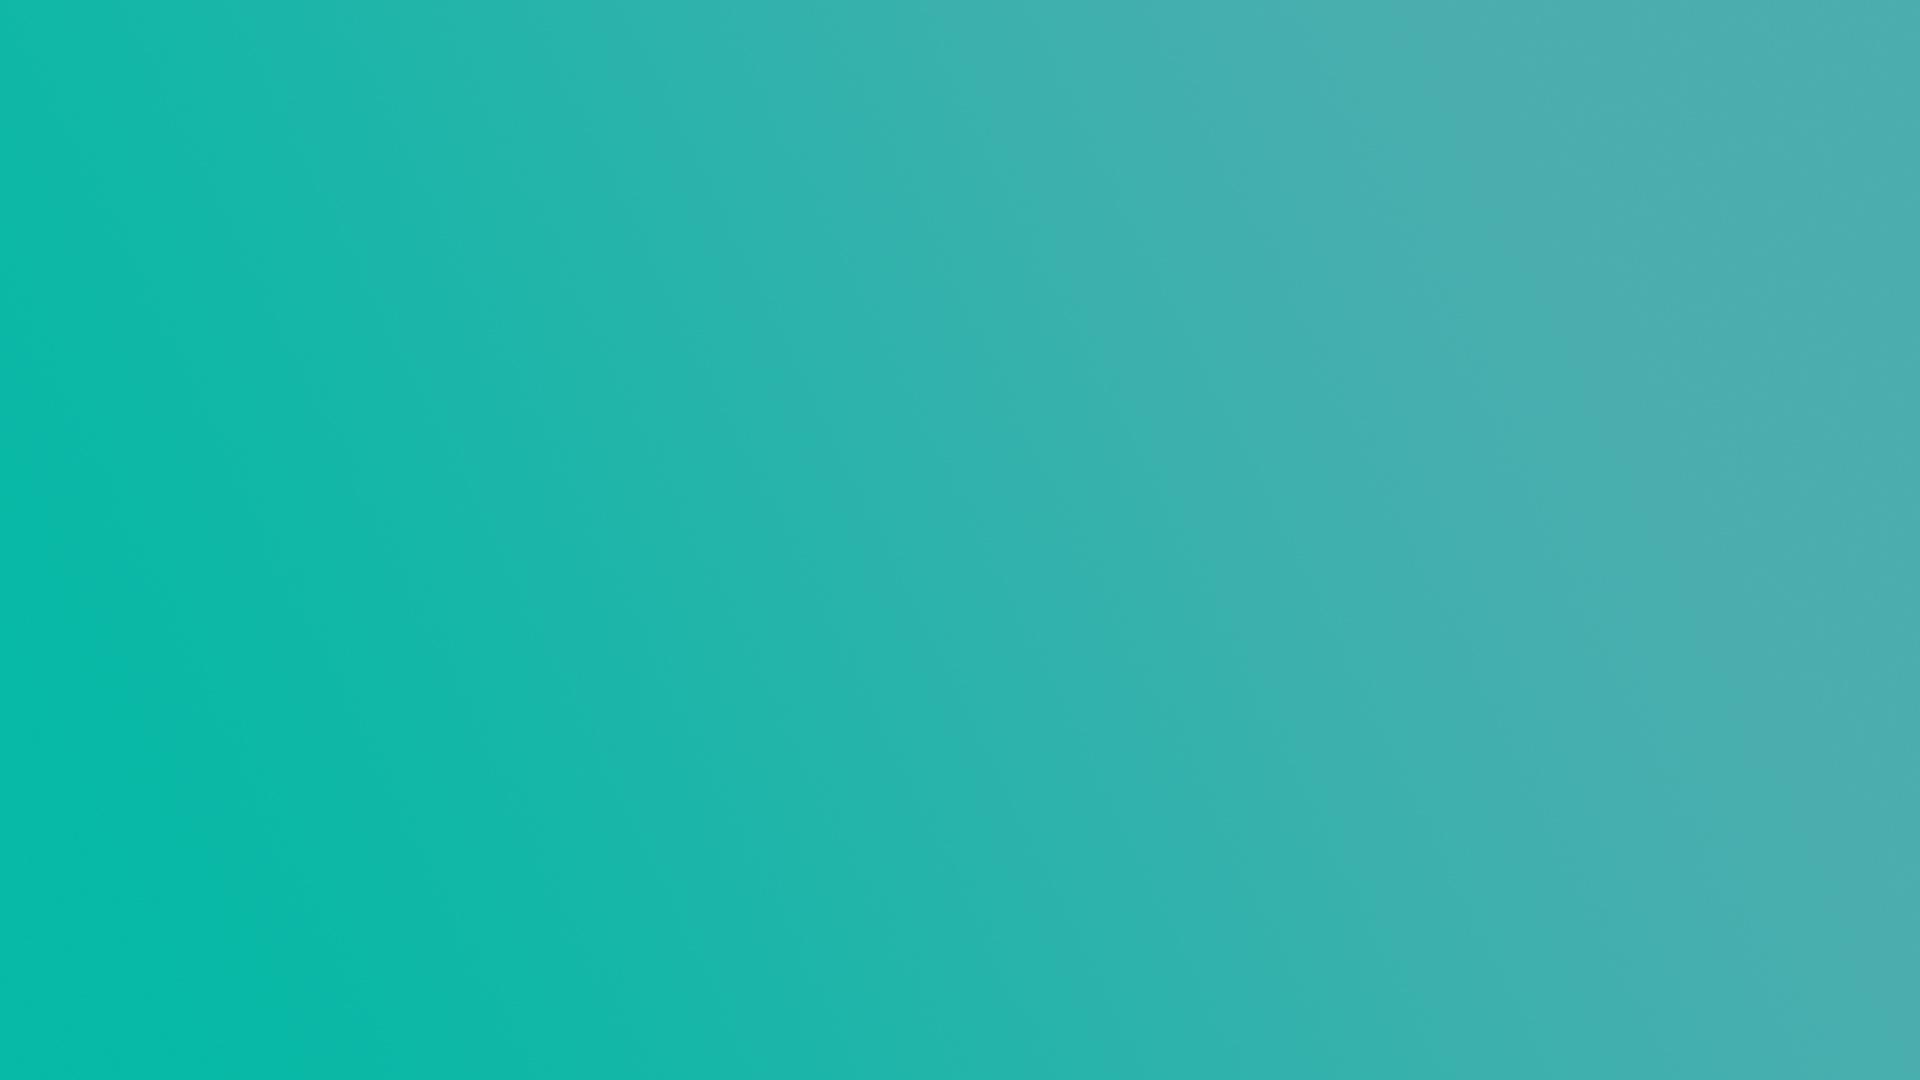 Free Download Blank Wallpaper Azure 1920x1080 For Your Desktop